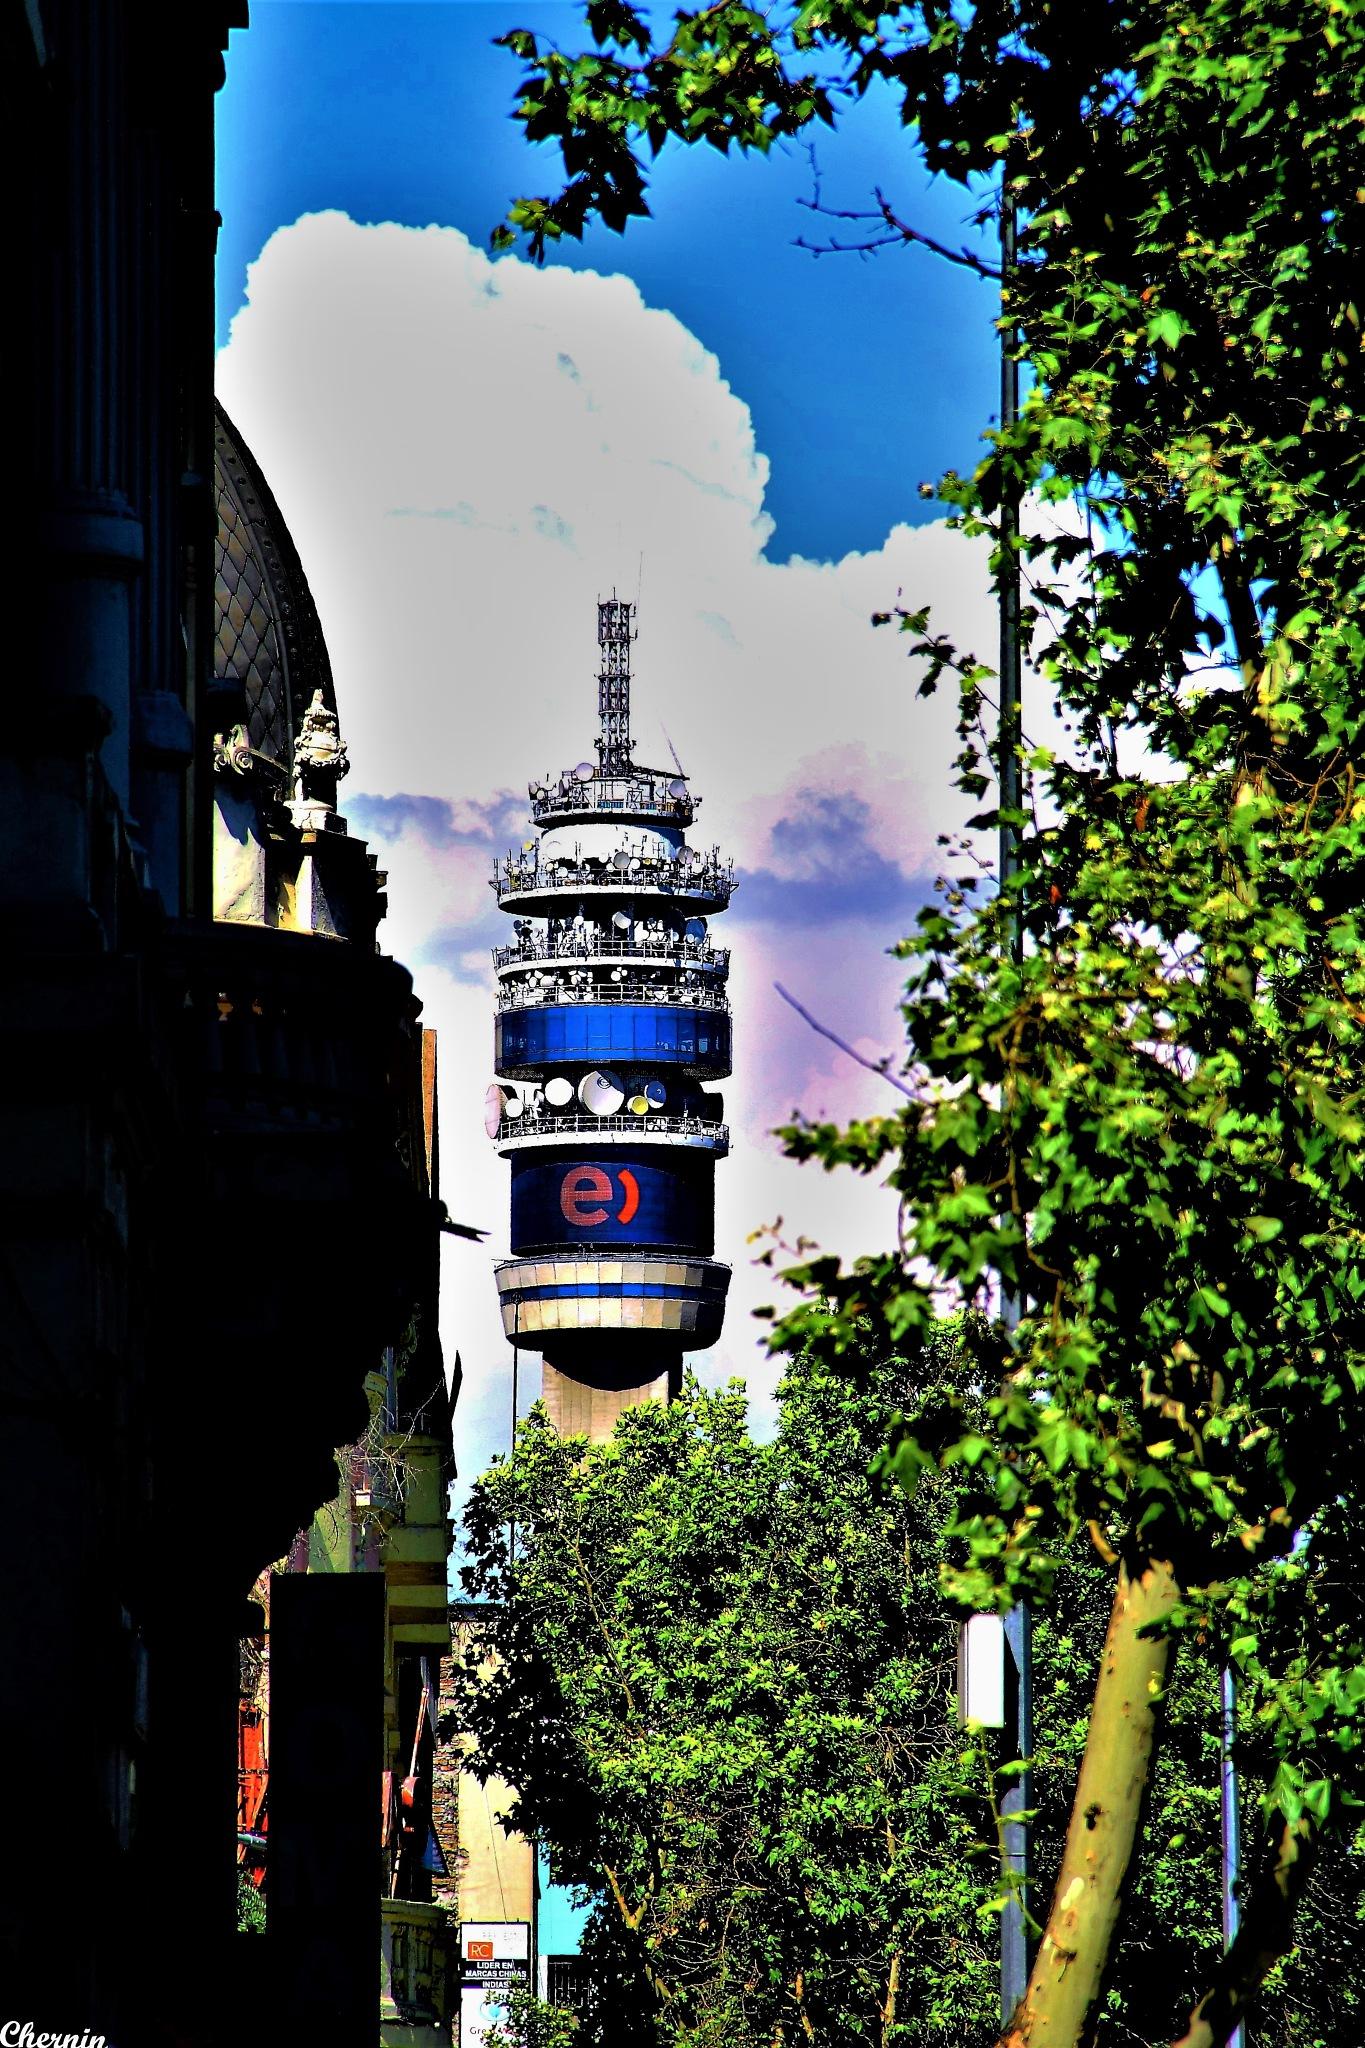 entel tower by ichernin